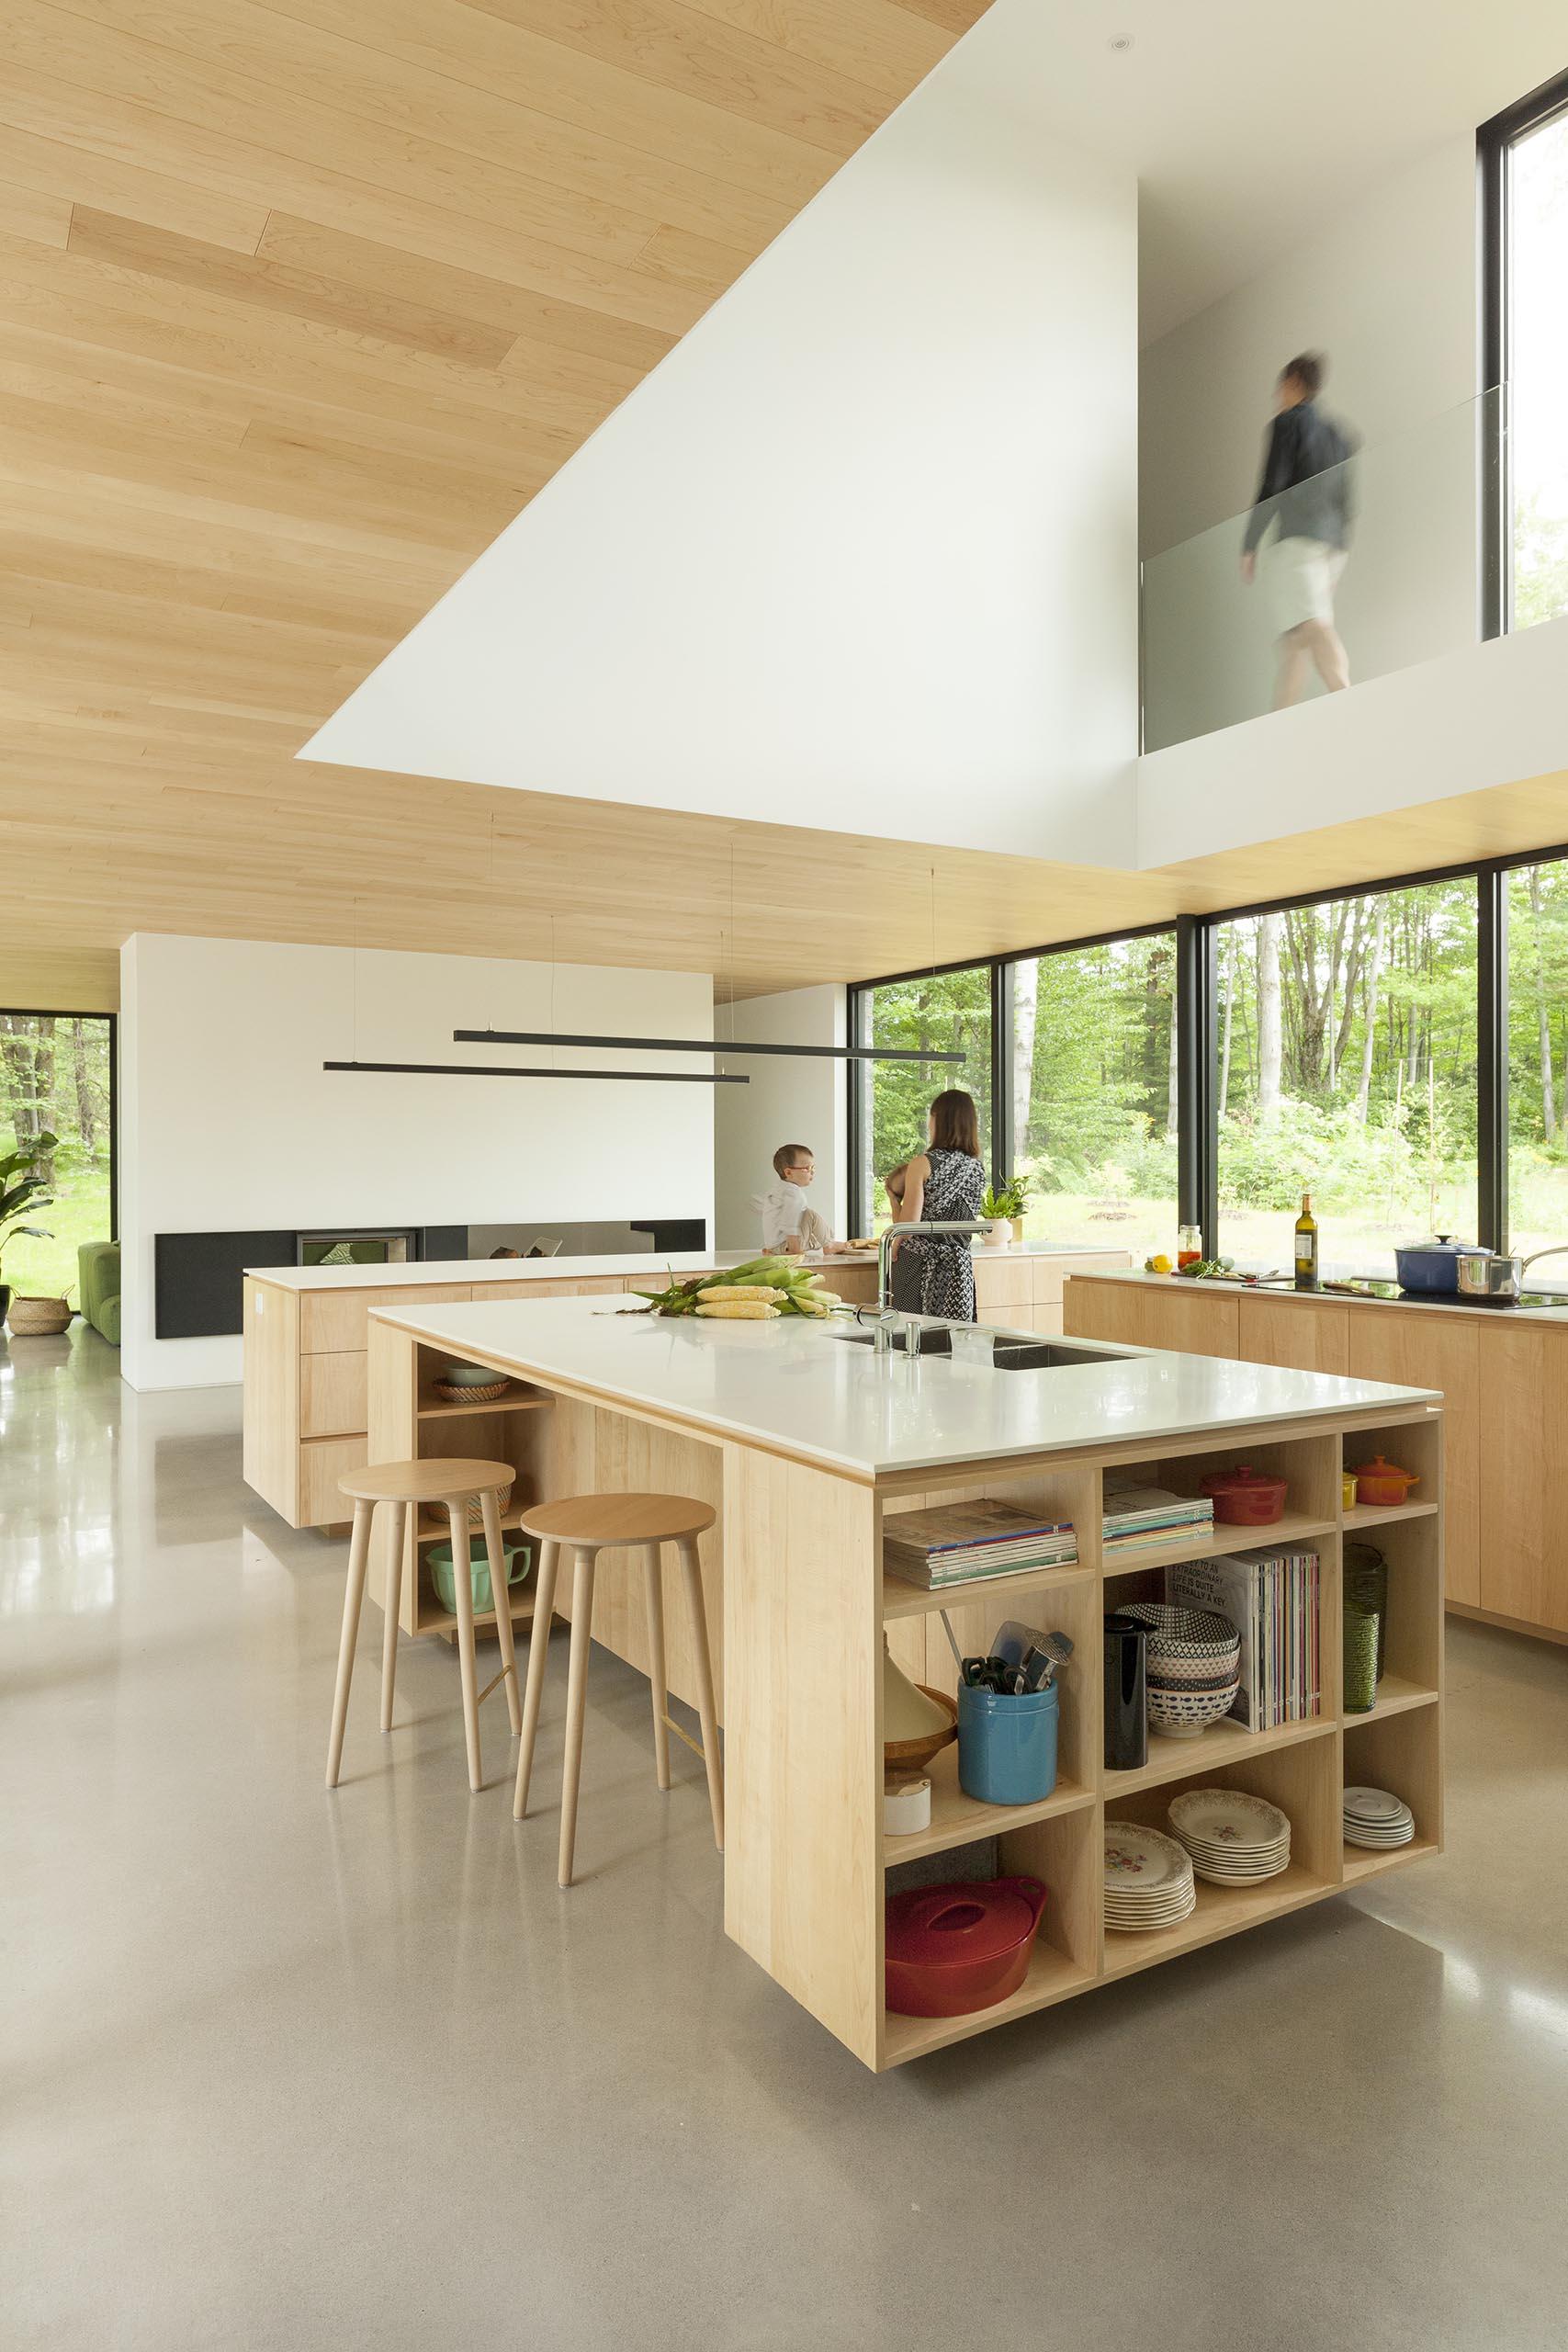 A modern kitchen with three islands that provide plenty of storage.